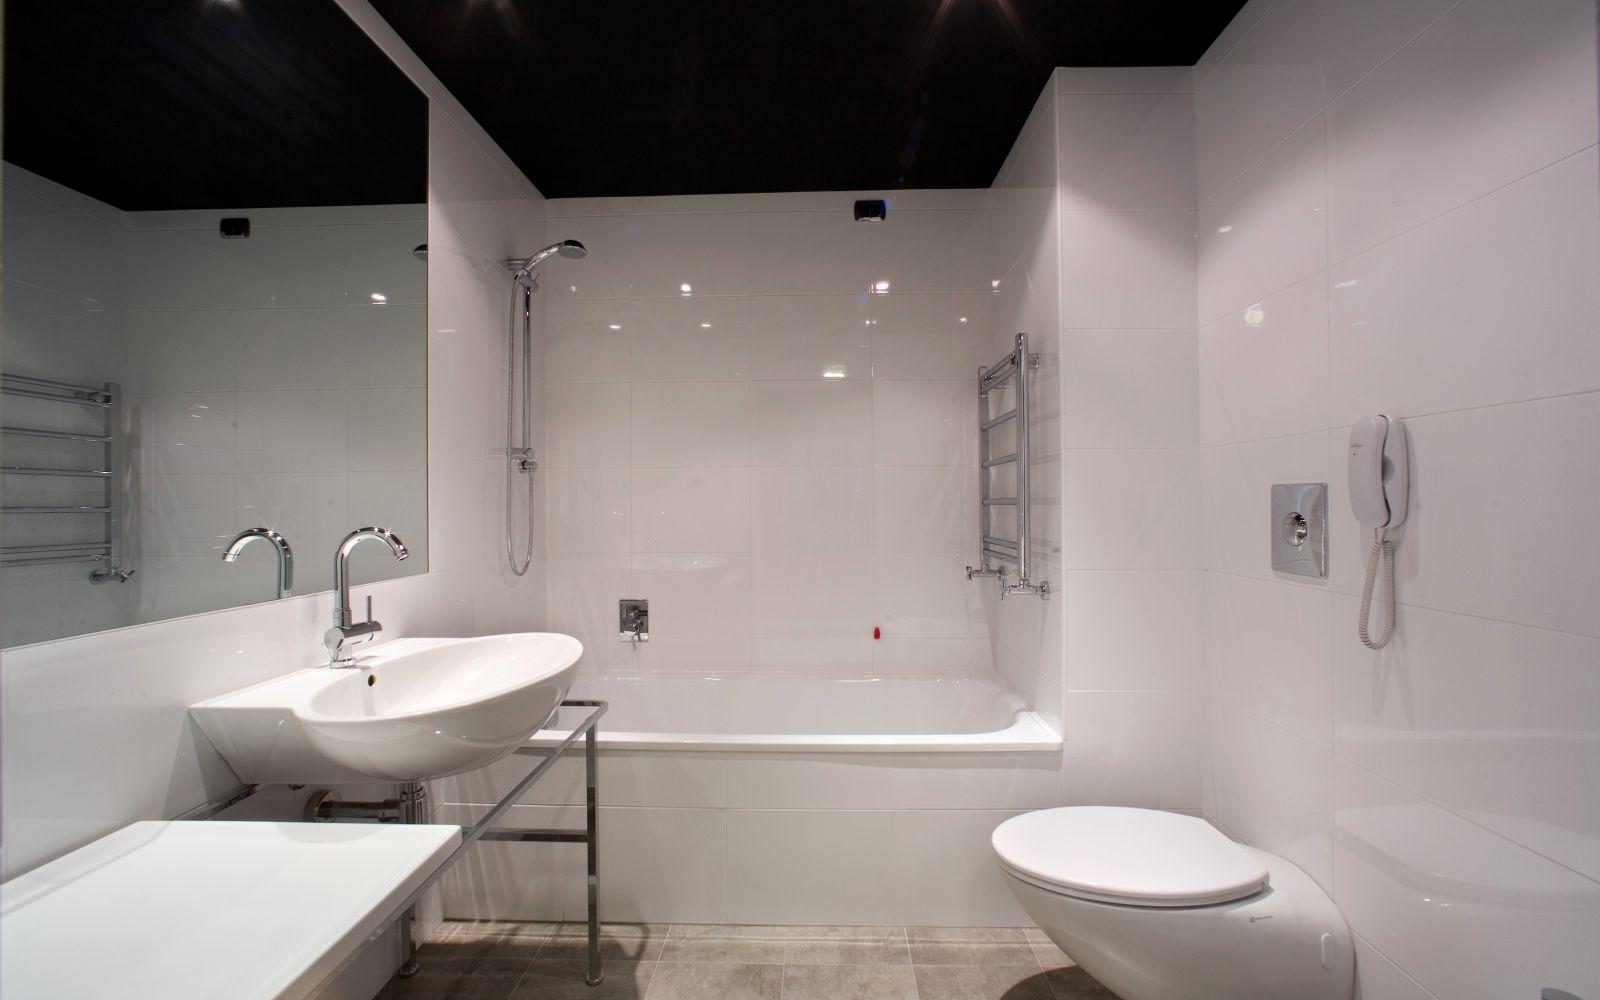 Cellule Bagno - Bathroom Pods